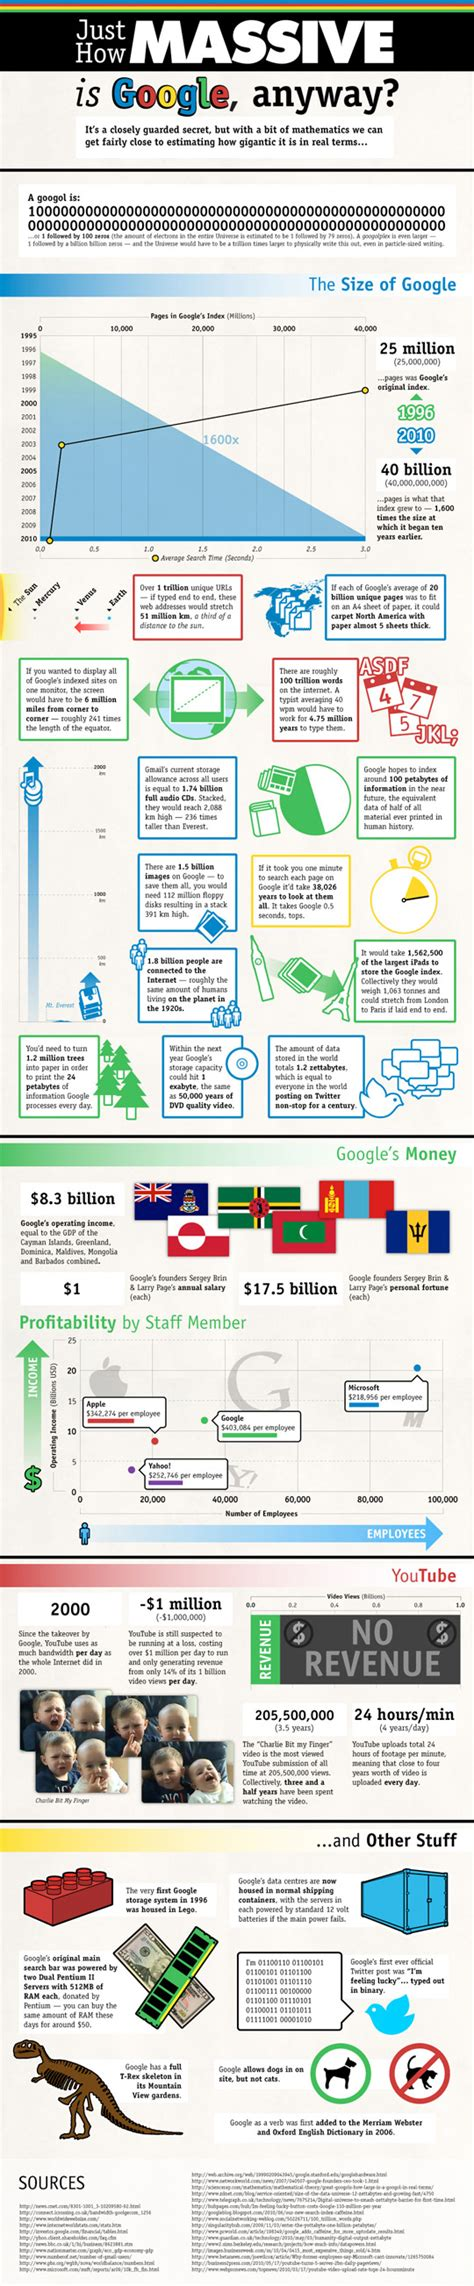 google images infographic 10 amazing google infographics econsultancy